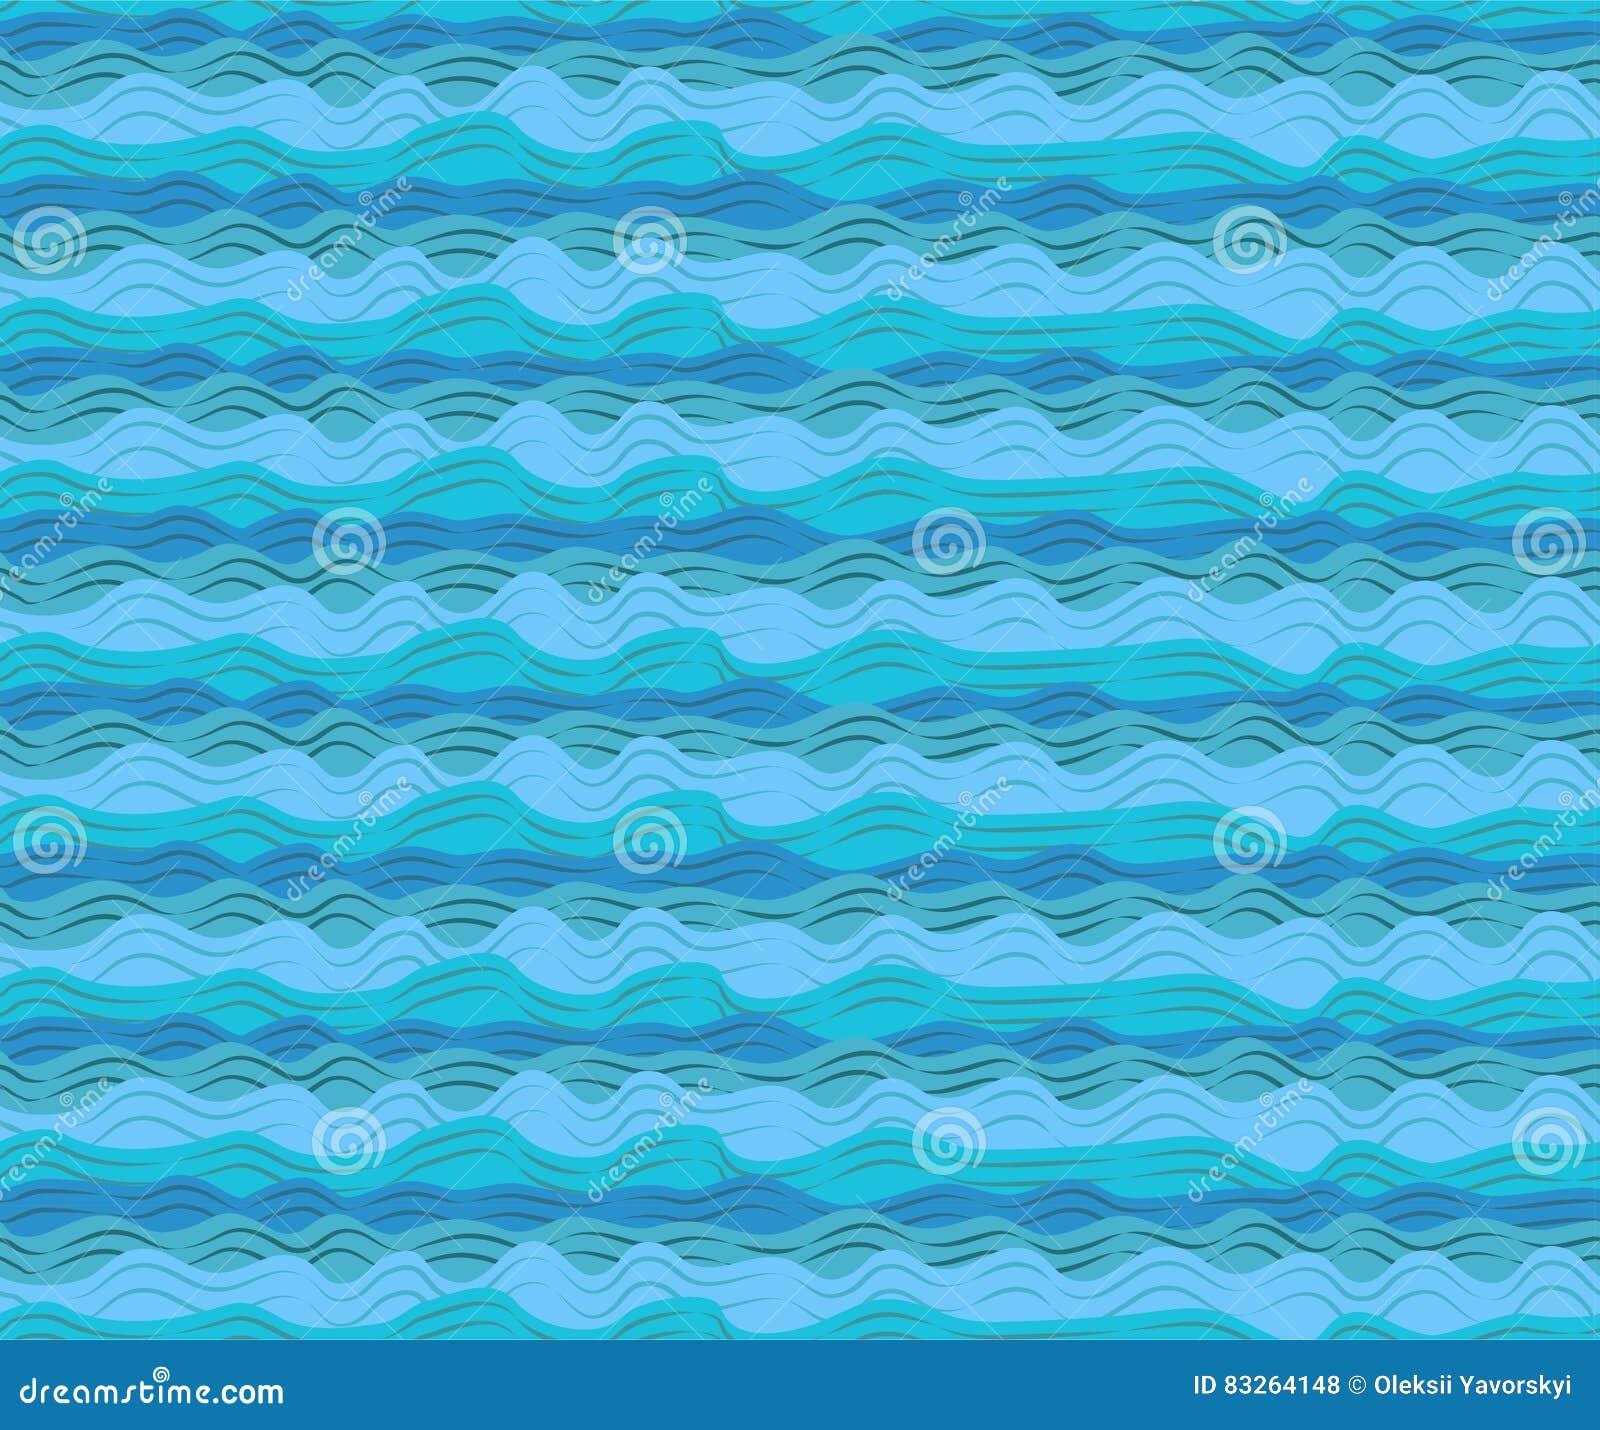 Water Sea Ocean Aqua Waves Wave Blue Pattern Seamless Calm